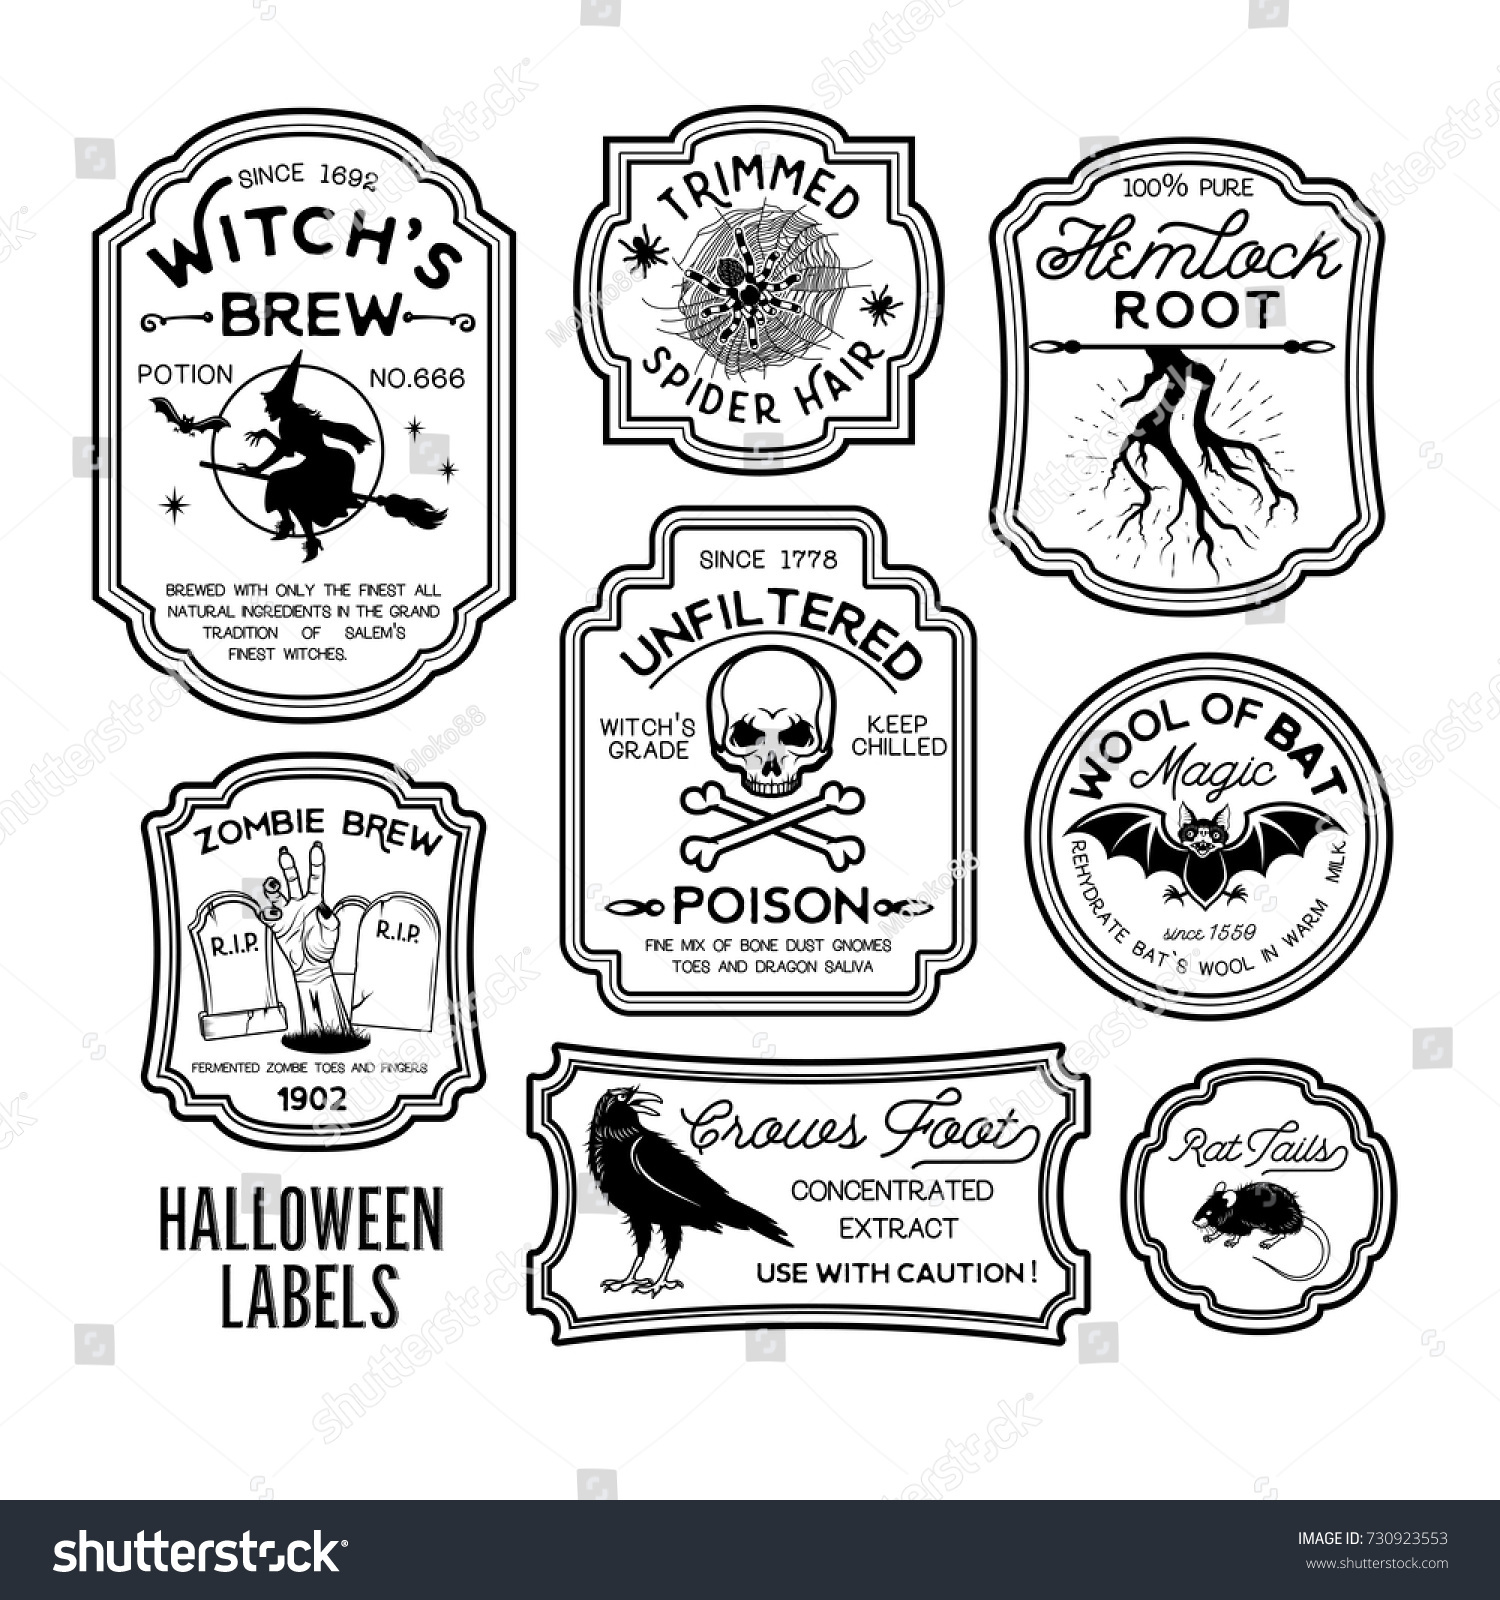 Halloween Bottle Labels Potion Labels Vector Stock Vector